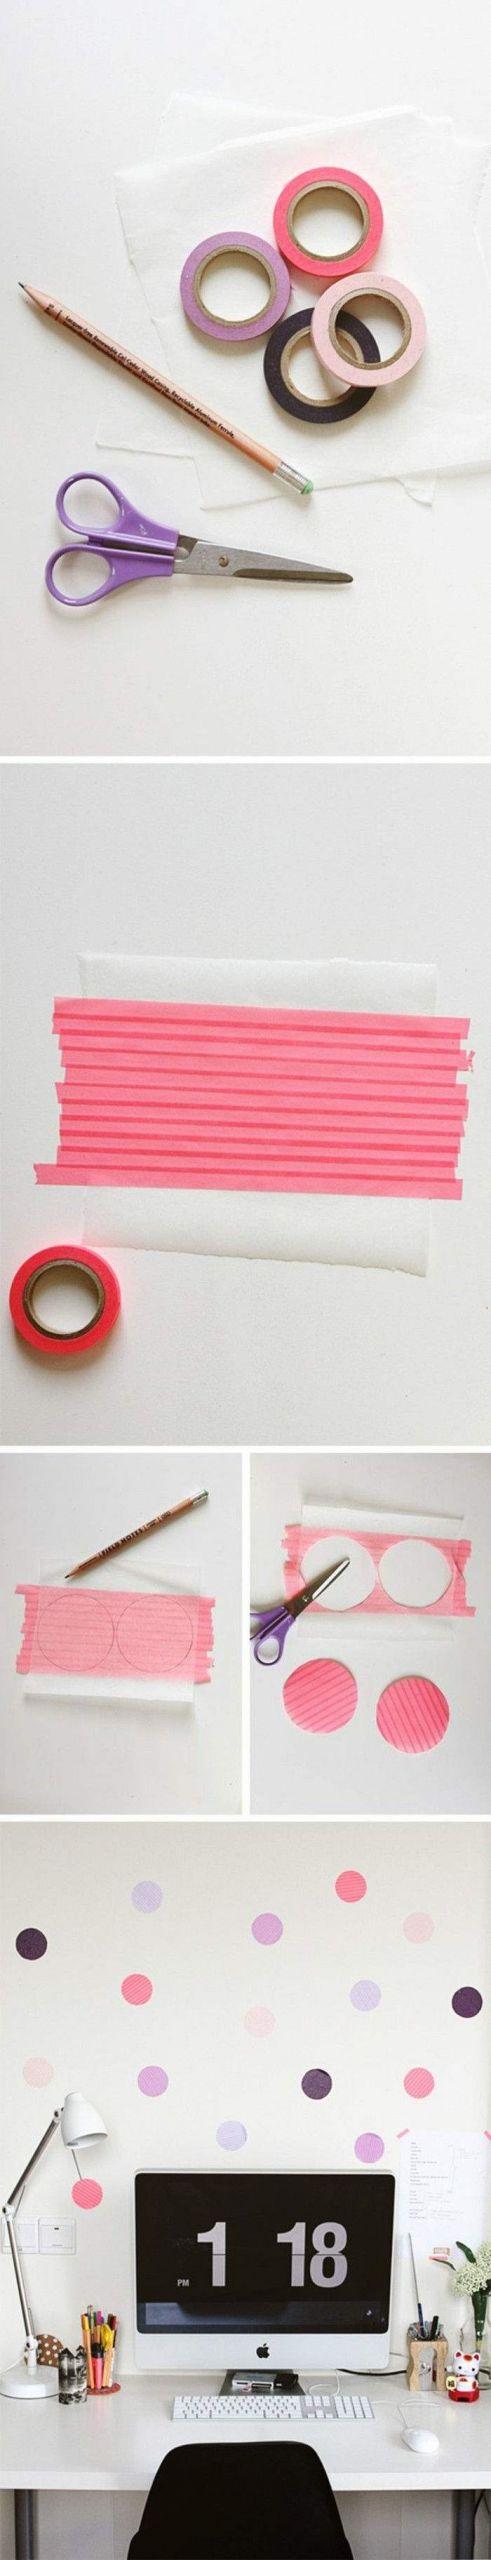 diy ideen mit washi tape wanddeko selber basteln